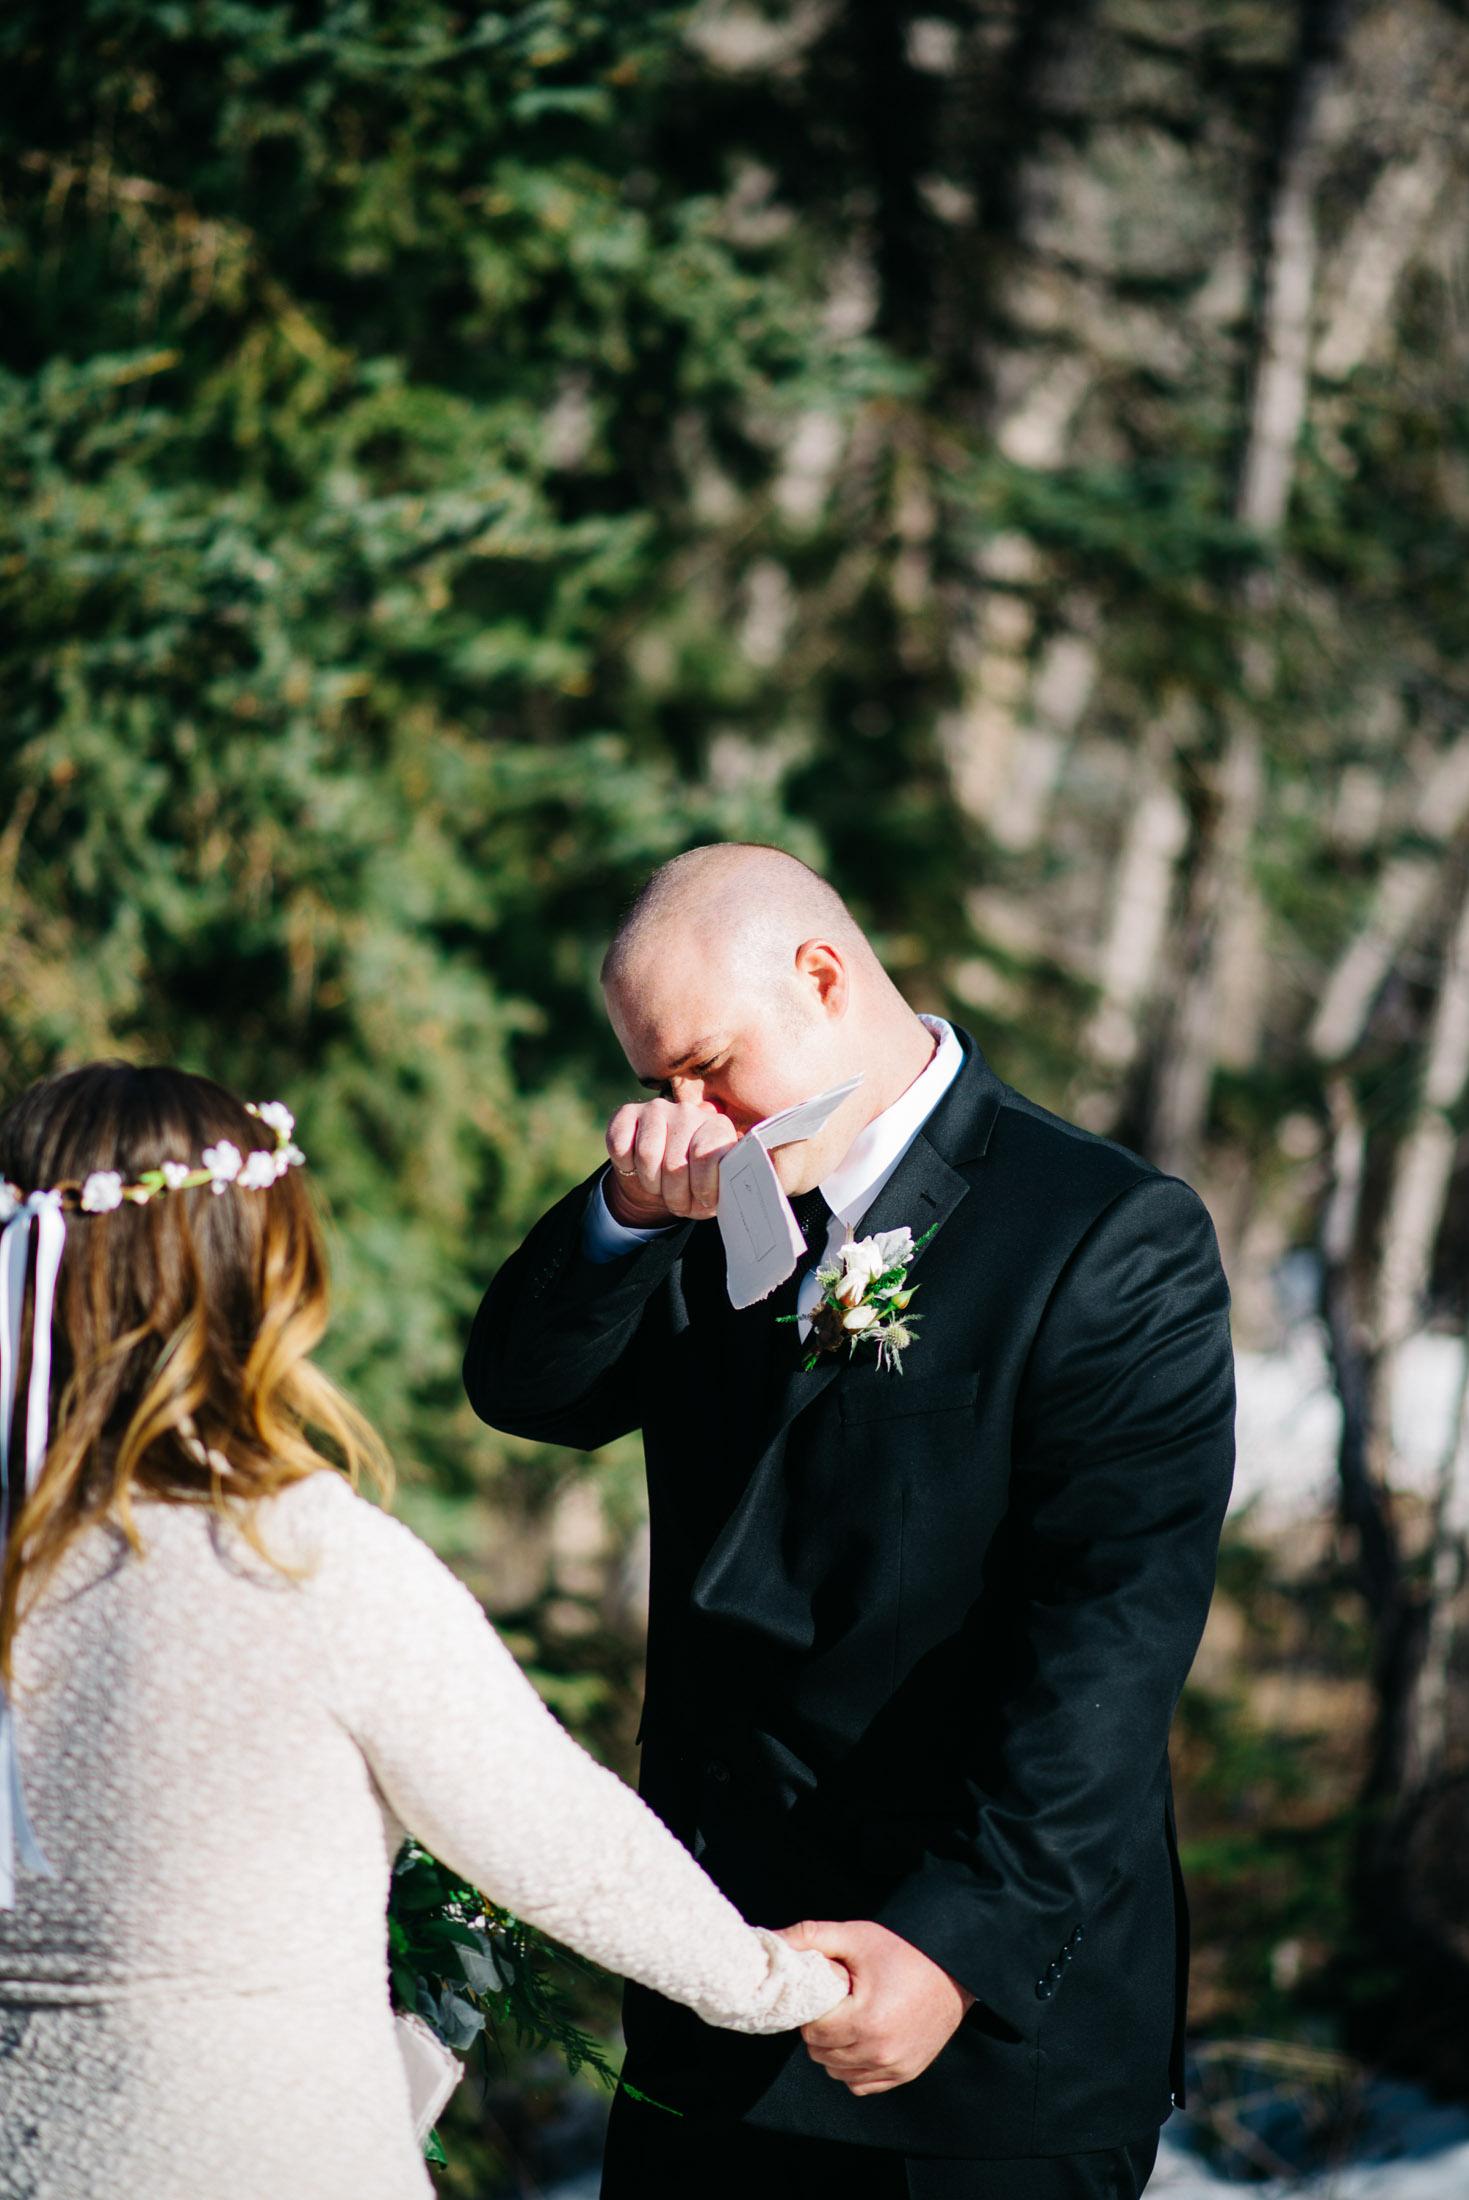 75elopement-photographer-colorado-telluride-winter-wedding-mountain-wedding-photographer-paige&chad-0652.jpg